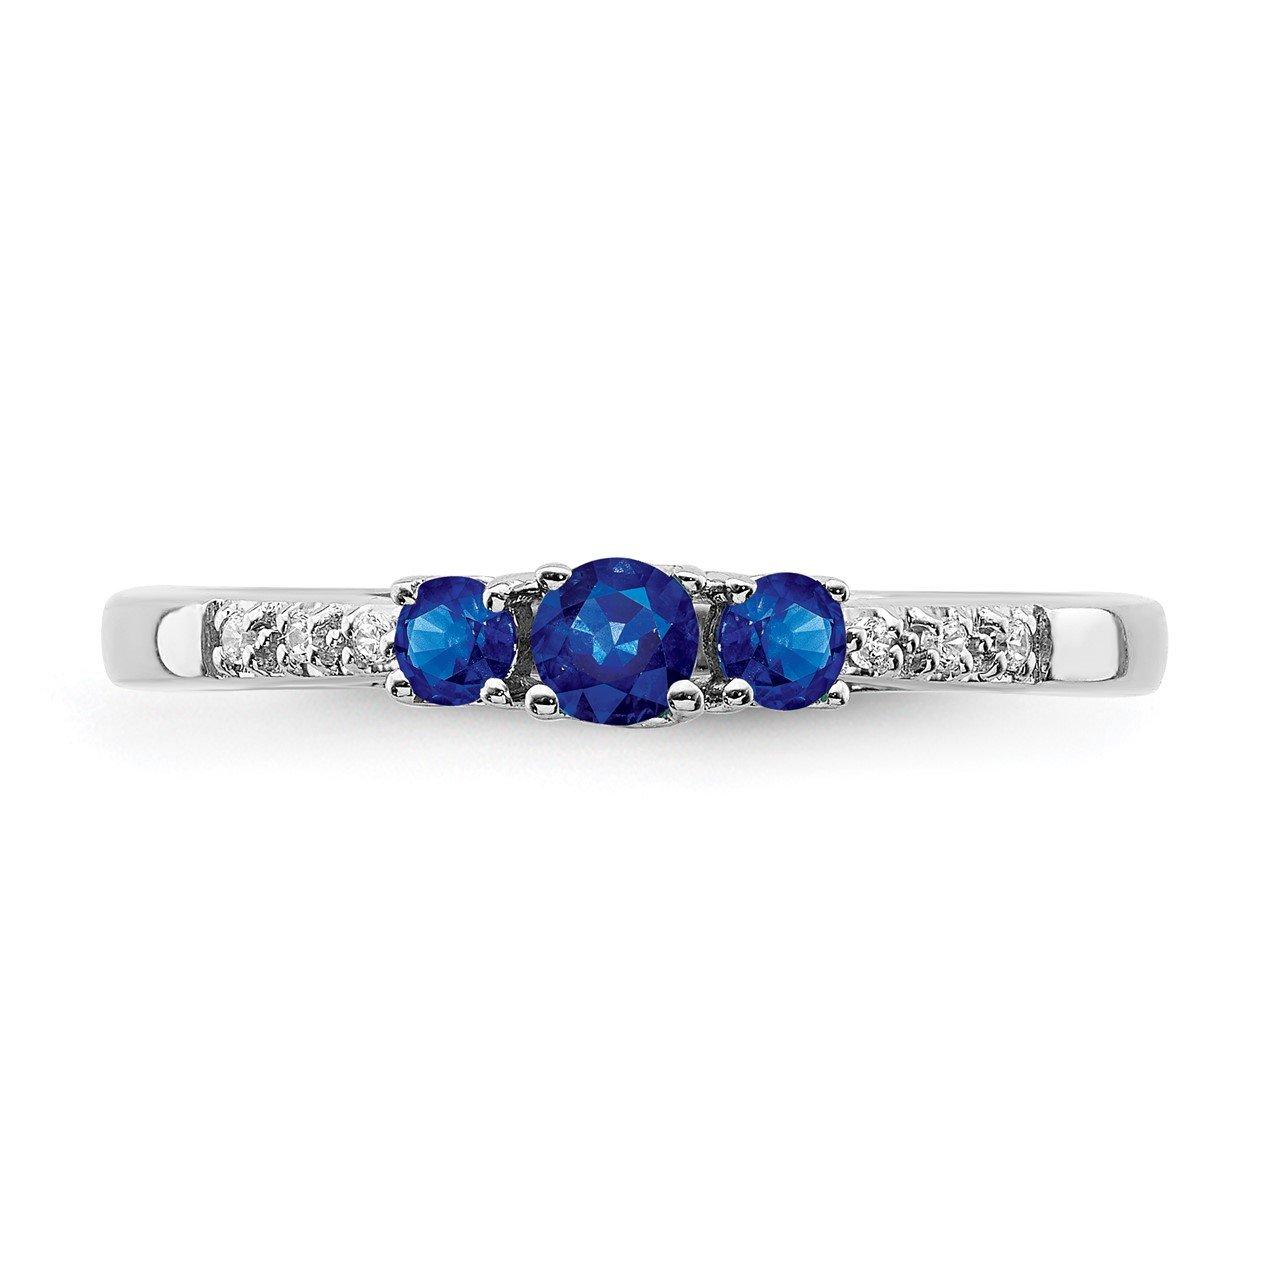 14k White Gold Sapphire and Diamond 3-stone Ring-4